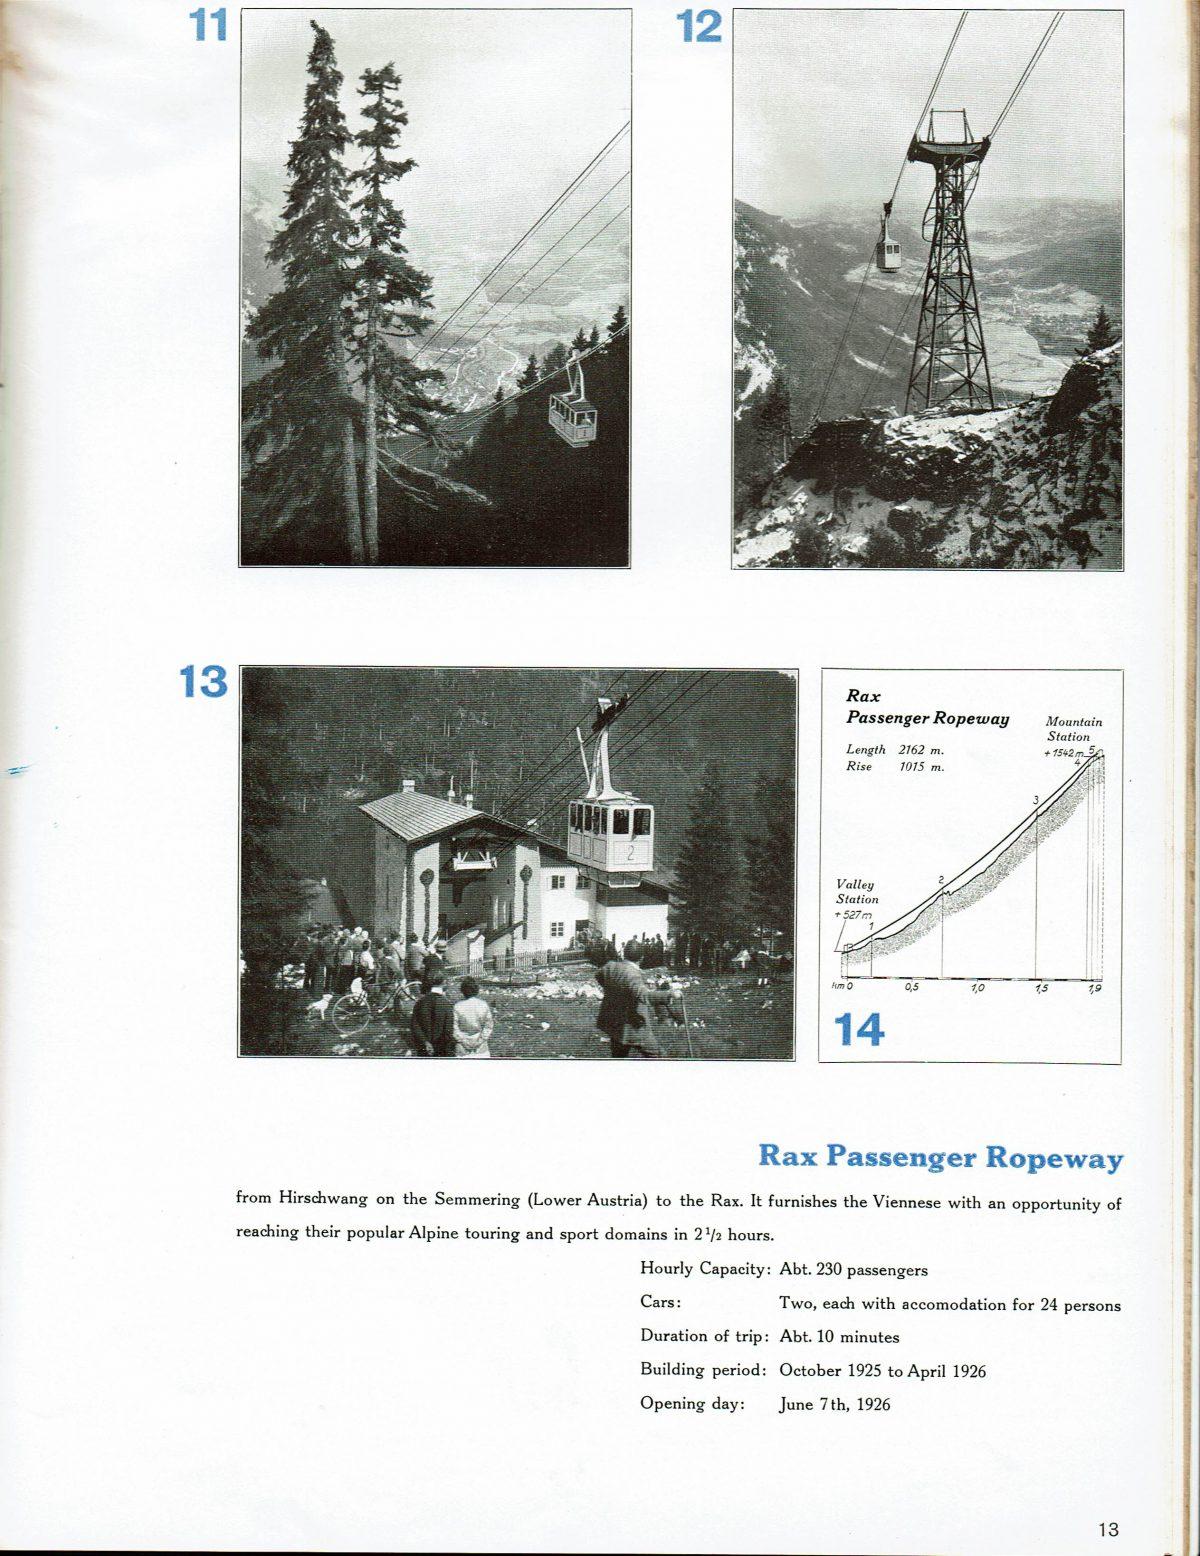 1933 Bleichert Passenger Arial Ropeways 12